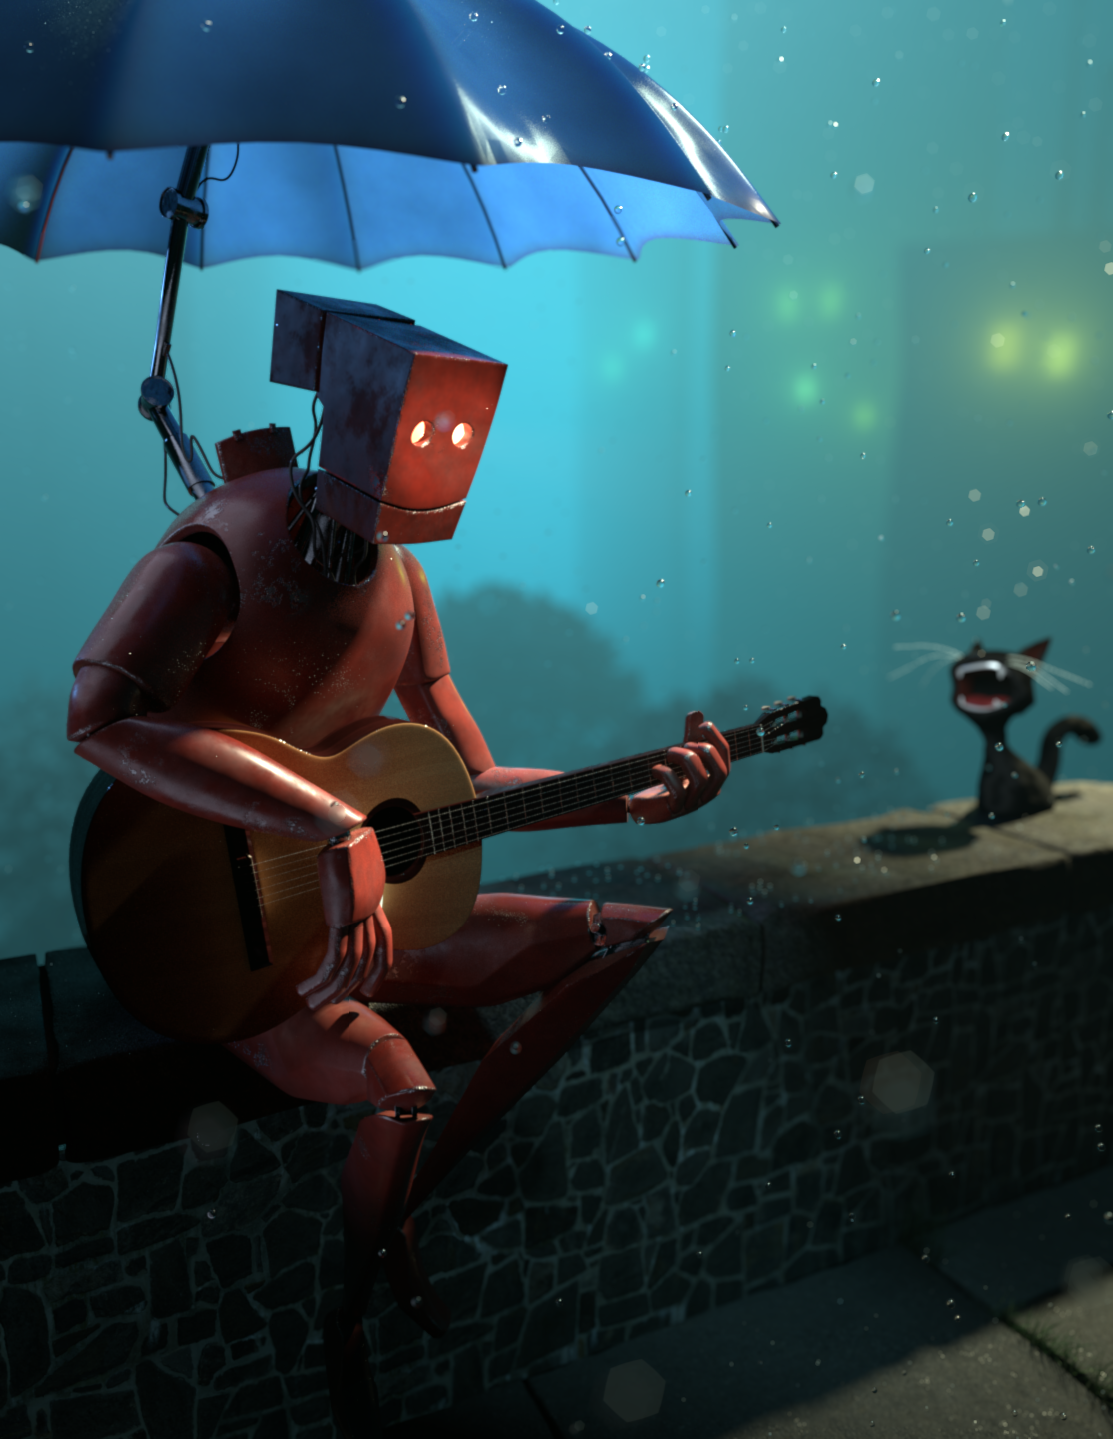 Robot and Guitar, concept by Goro Fujita